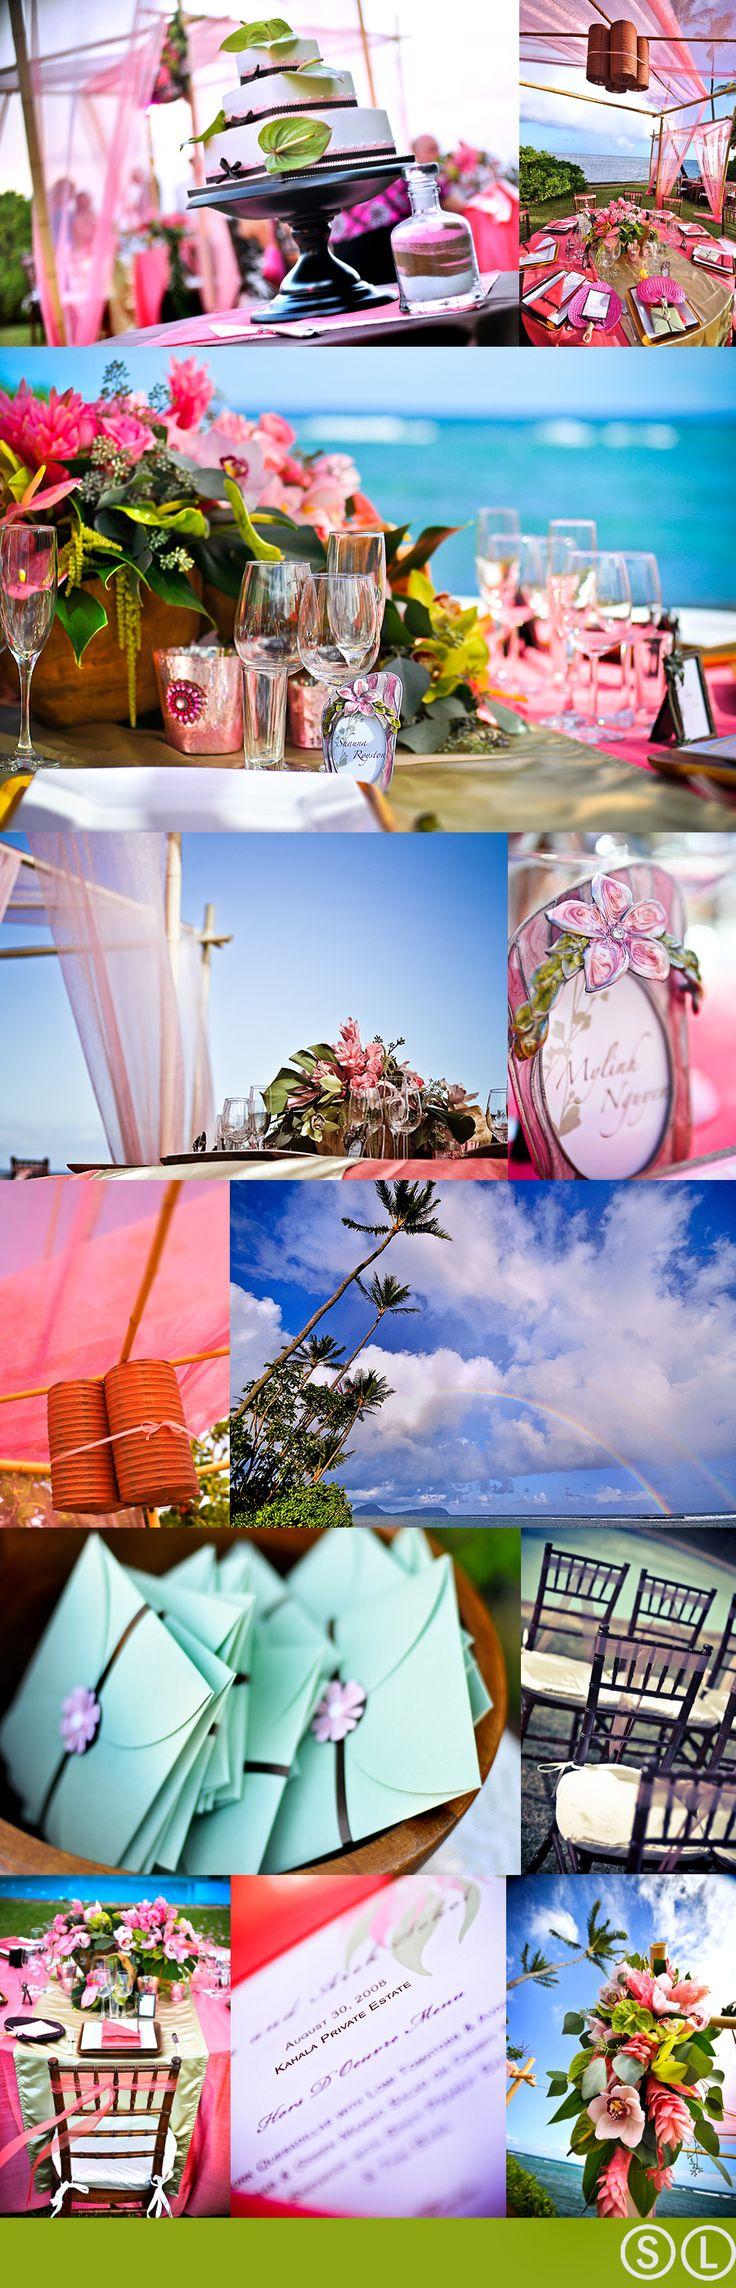 Hawaii outdoor wedding with a perfect mixture of Aloha Spirit!